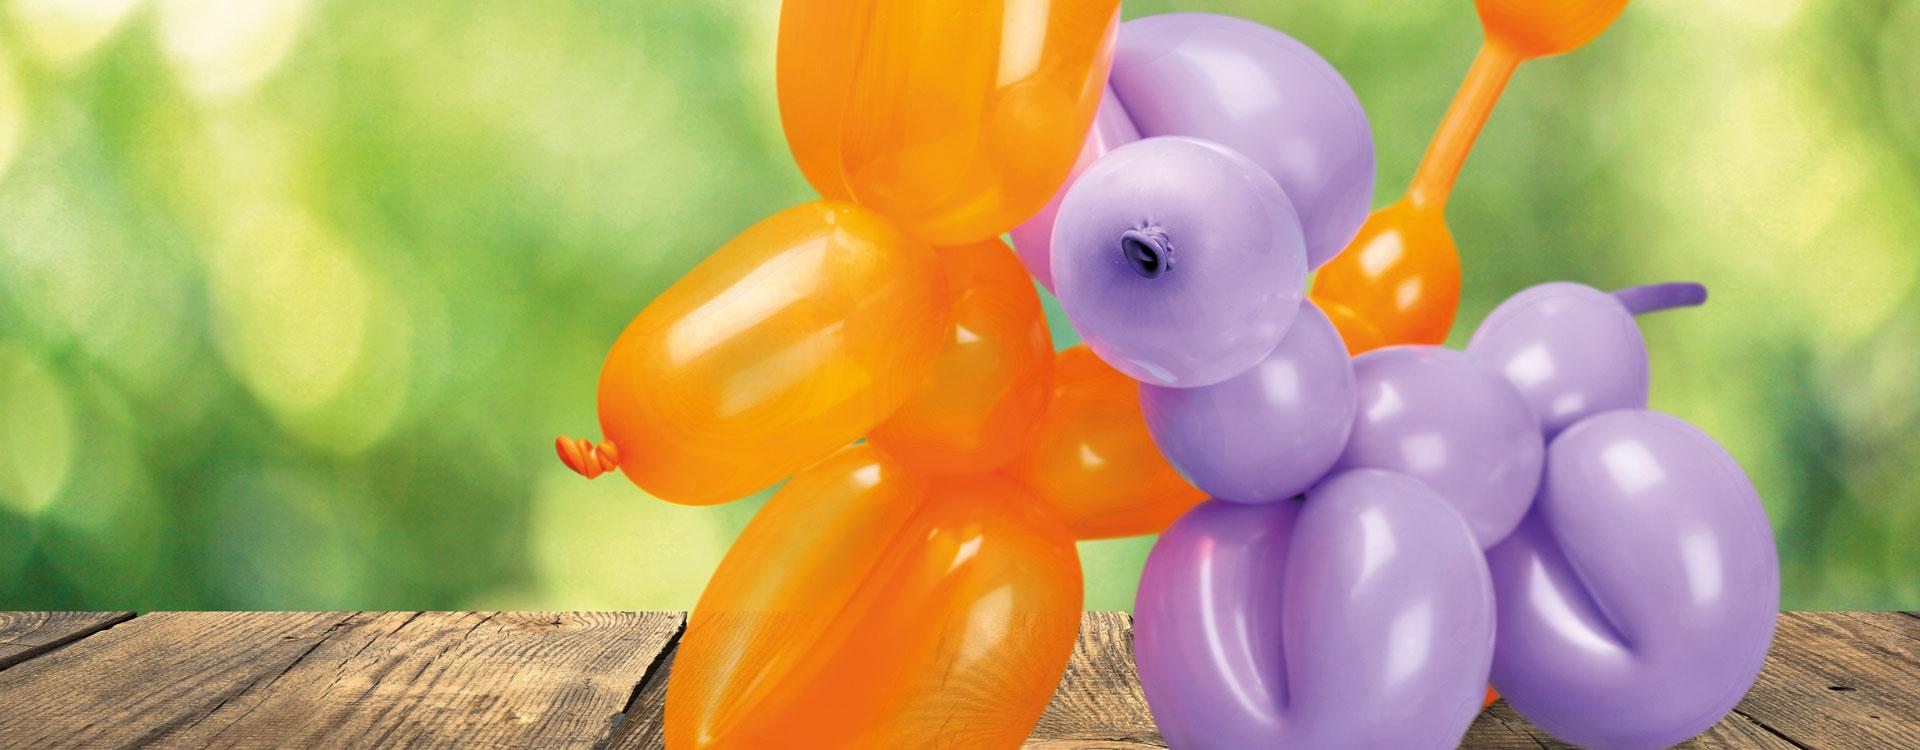 animations chien en ballons